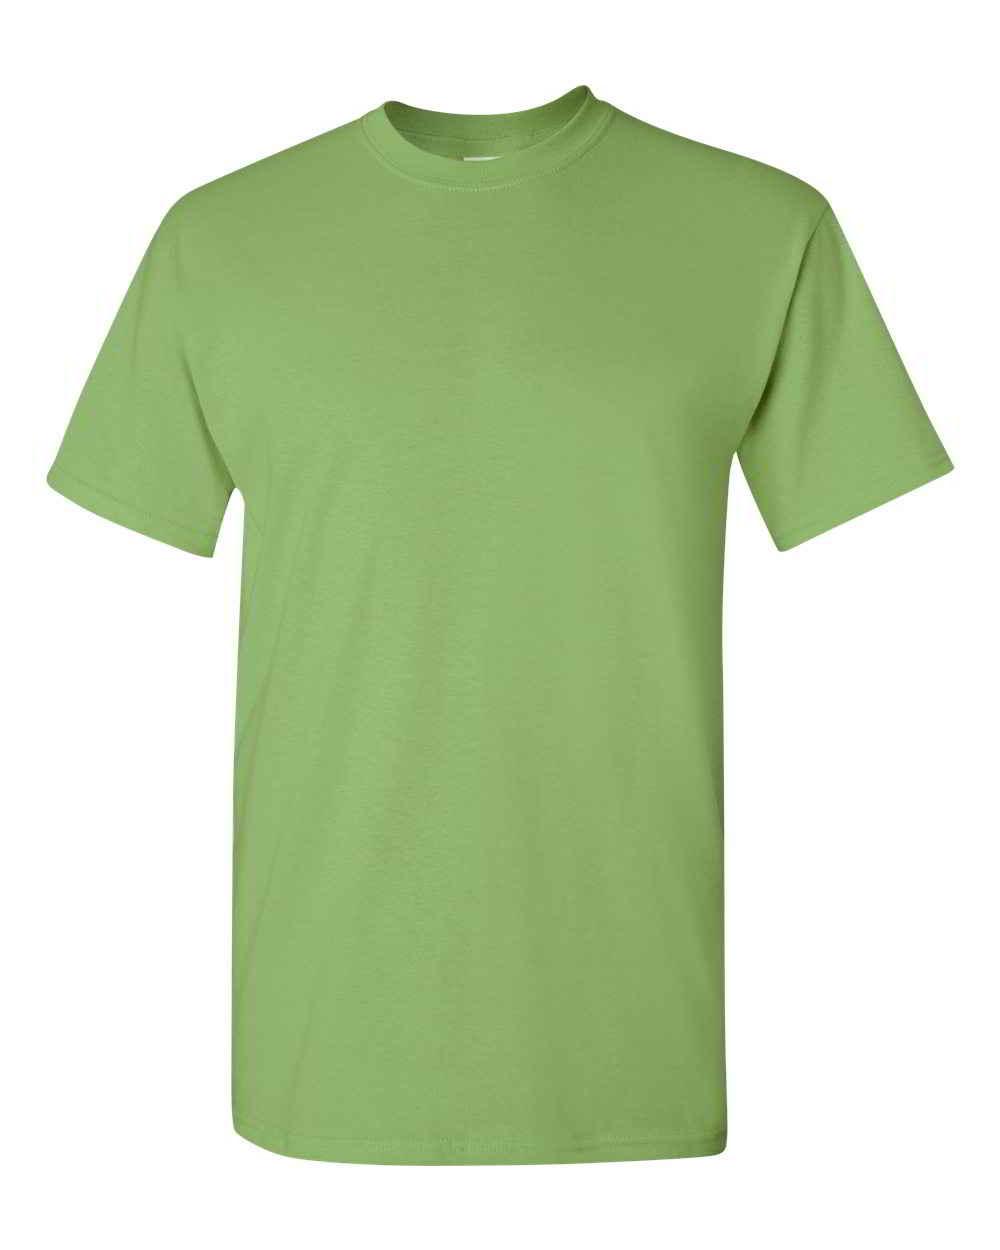 Gildan-Heavy-Cotton-Short-Sleeve-Mens-Green-T-Shirts-5000 thumbnail 16